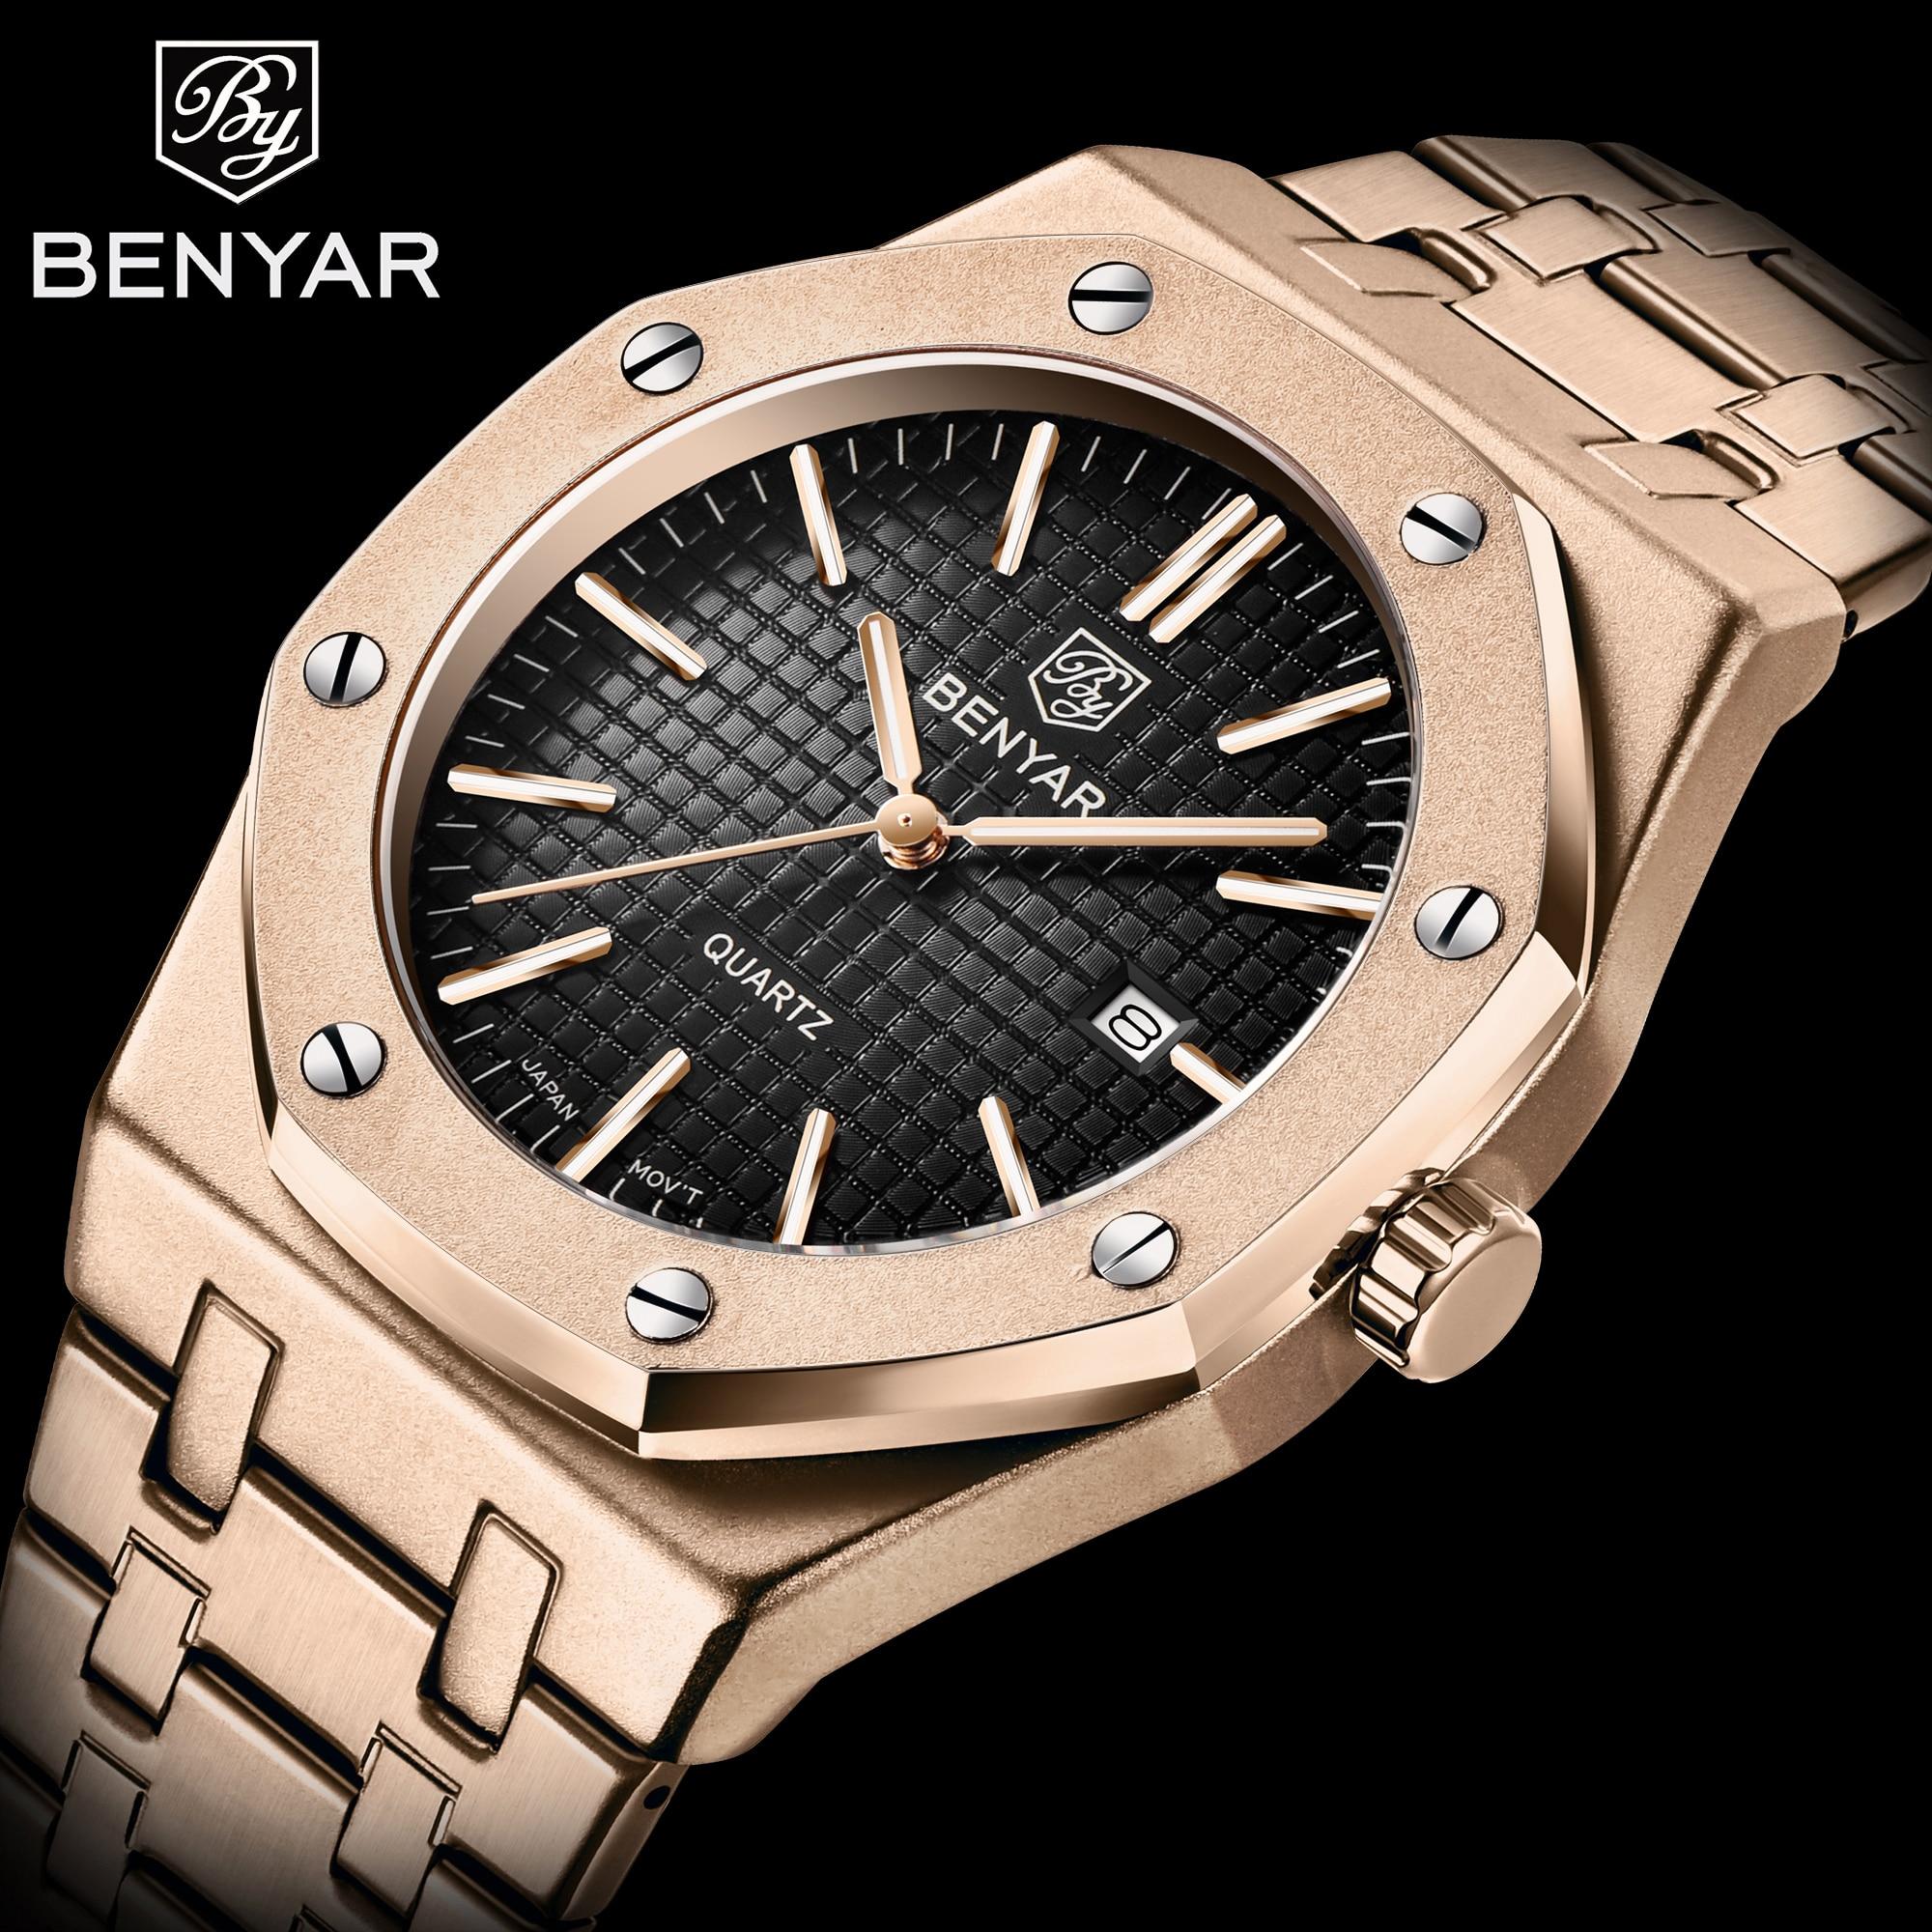 BENYAR Luxury Brand Mens Watches Business Quartz Watch Men Fashion Casual Watches Sport Waterproof Clock Man Relojes Hombre 2019